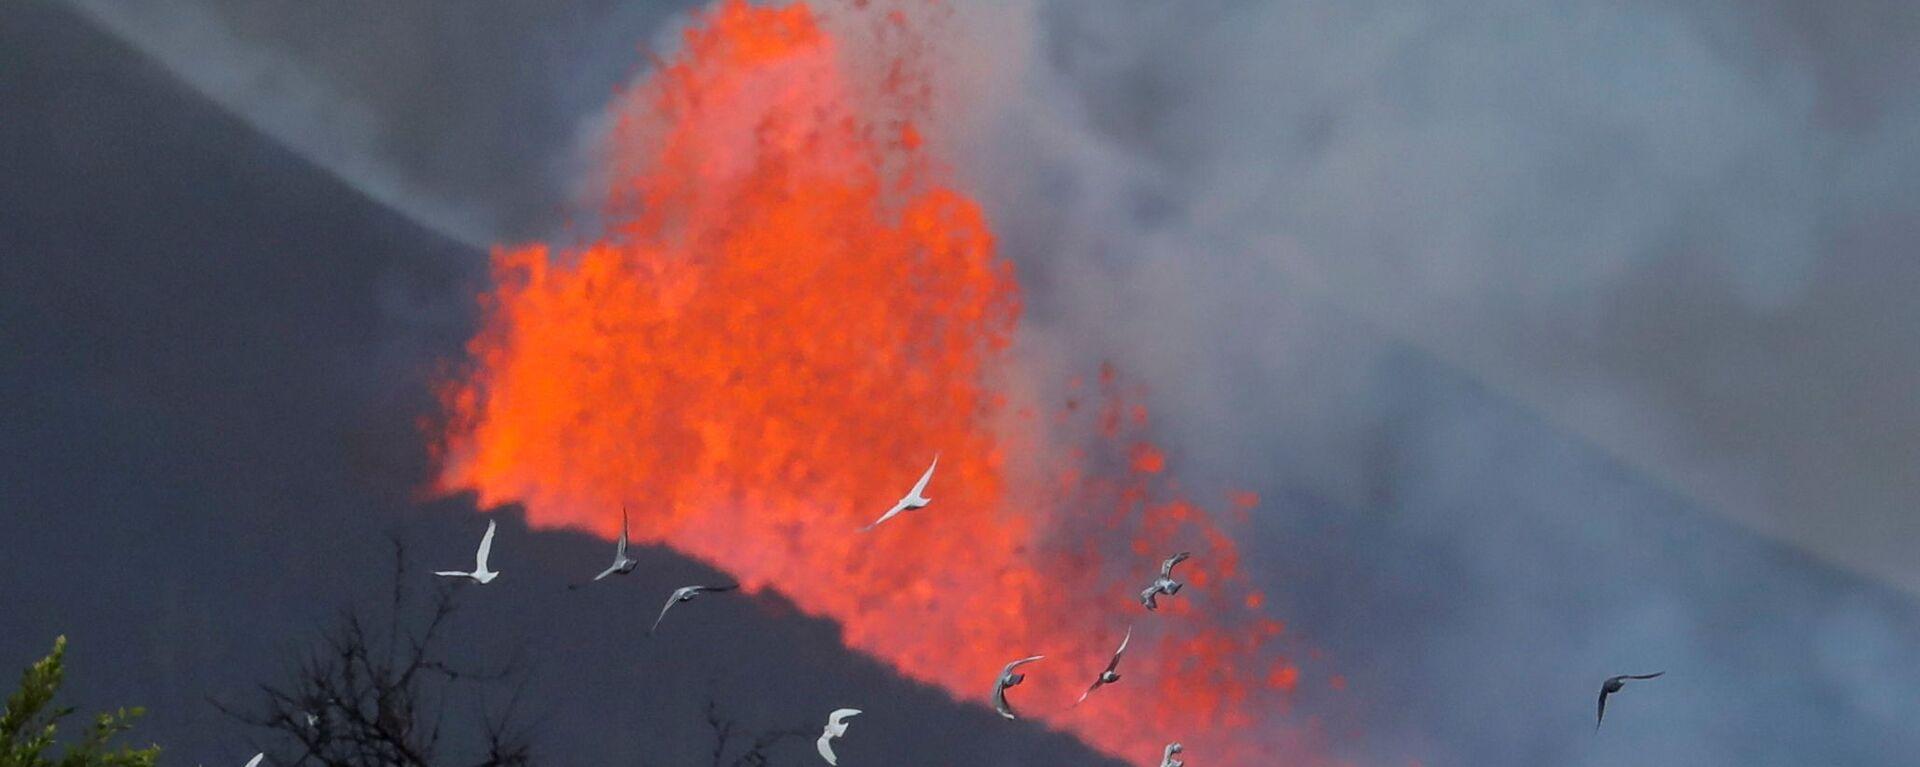 Golubi na fone lavы posle izverženiя vulkana na kanarskom ostrove La-Palьma  - Sputnik Srbija, 1920, 05.10.2021